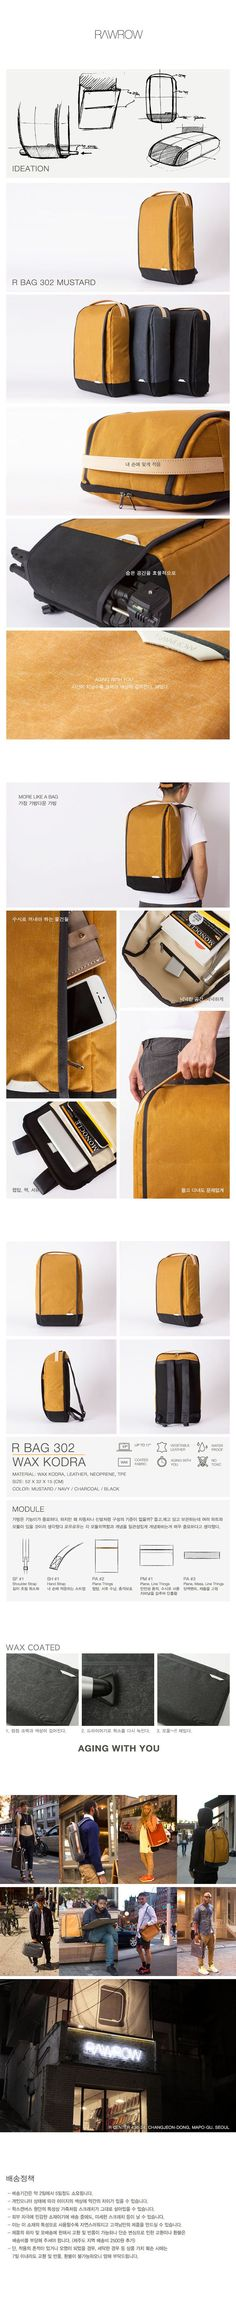 RAWROW SHOP - accessories bags, oversized bags, brown bag purse *sponsored https://www.pinterest.com/bags_bag/ https://www.pinterest.com/explore/bags/ https://www.pinterest.com/bags_bag/bags/ https://www.cuyana.com/shop/bags.html